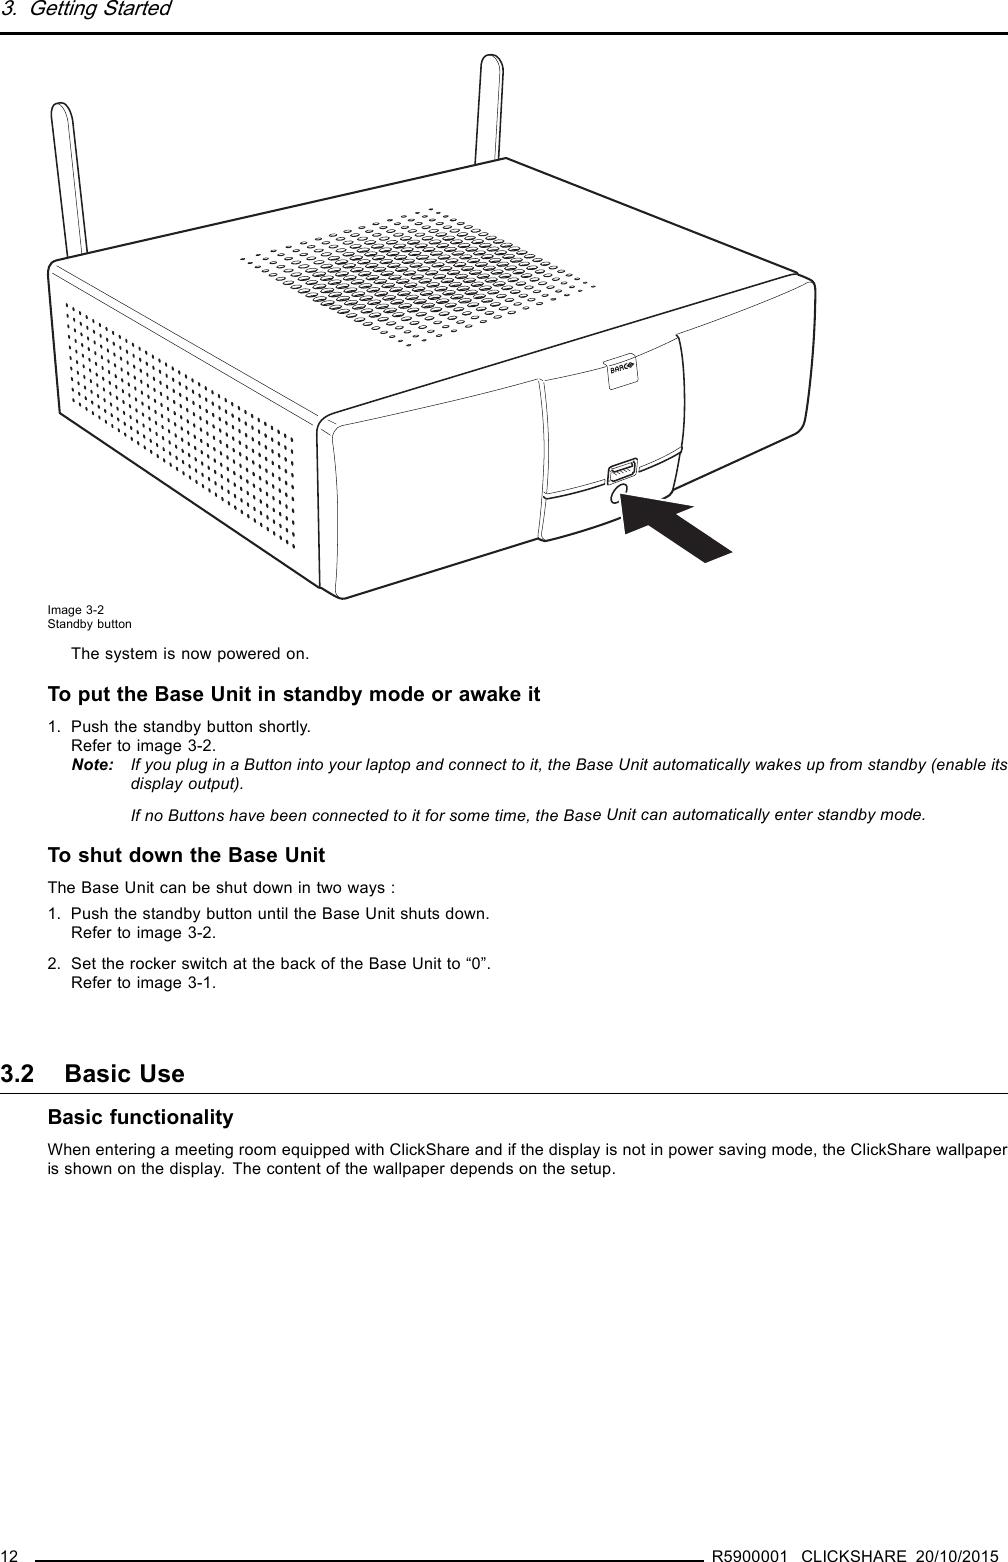 Barco NV R9861500D01 ClickShare Button User Manual 1